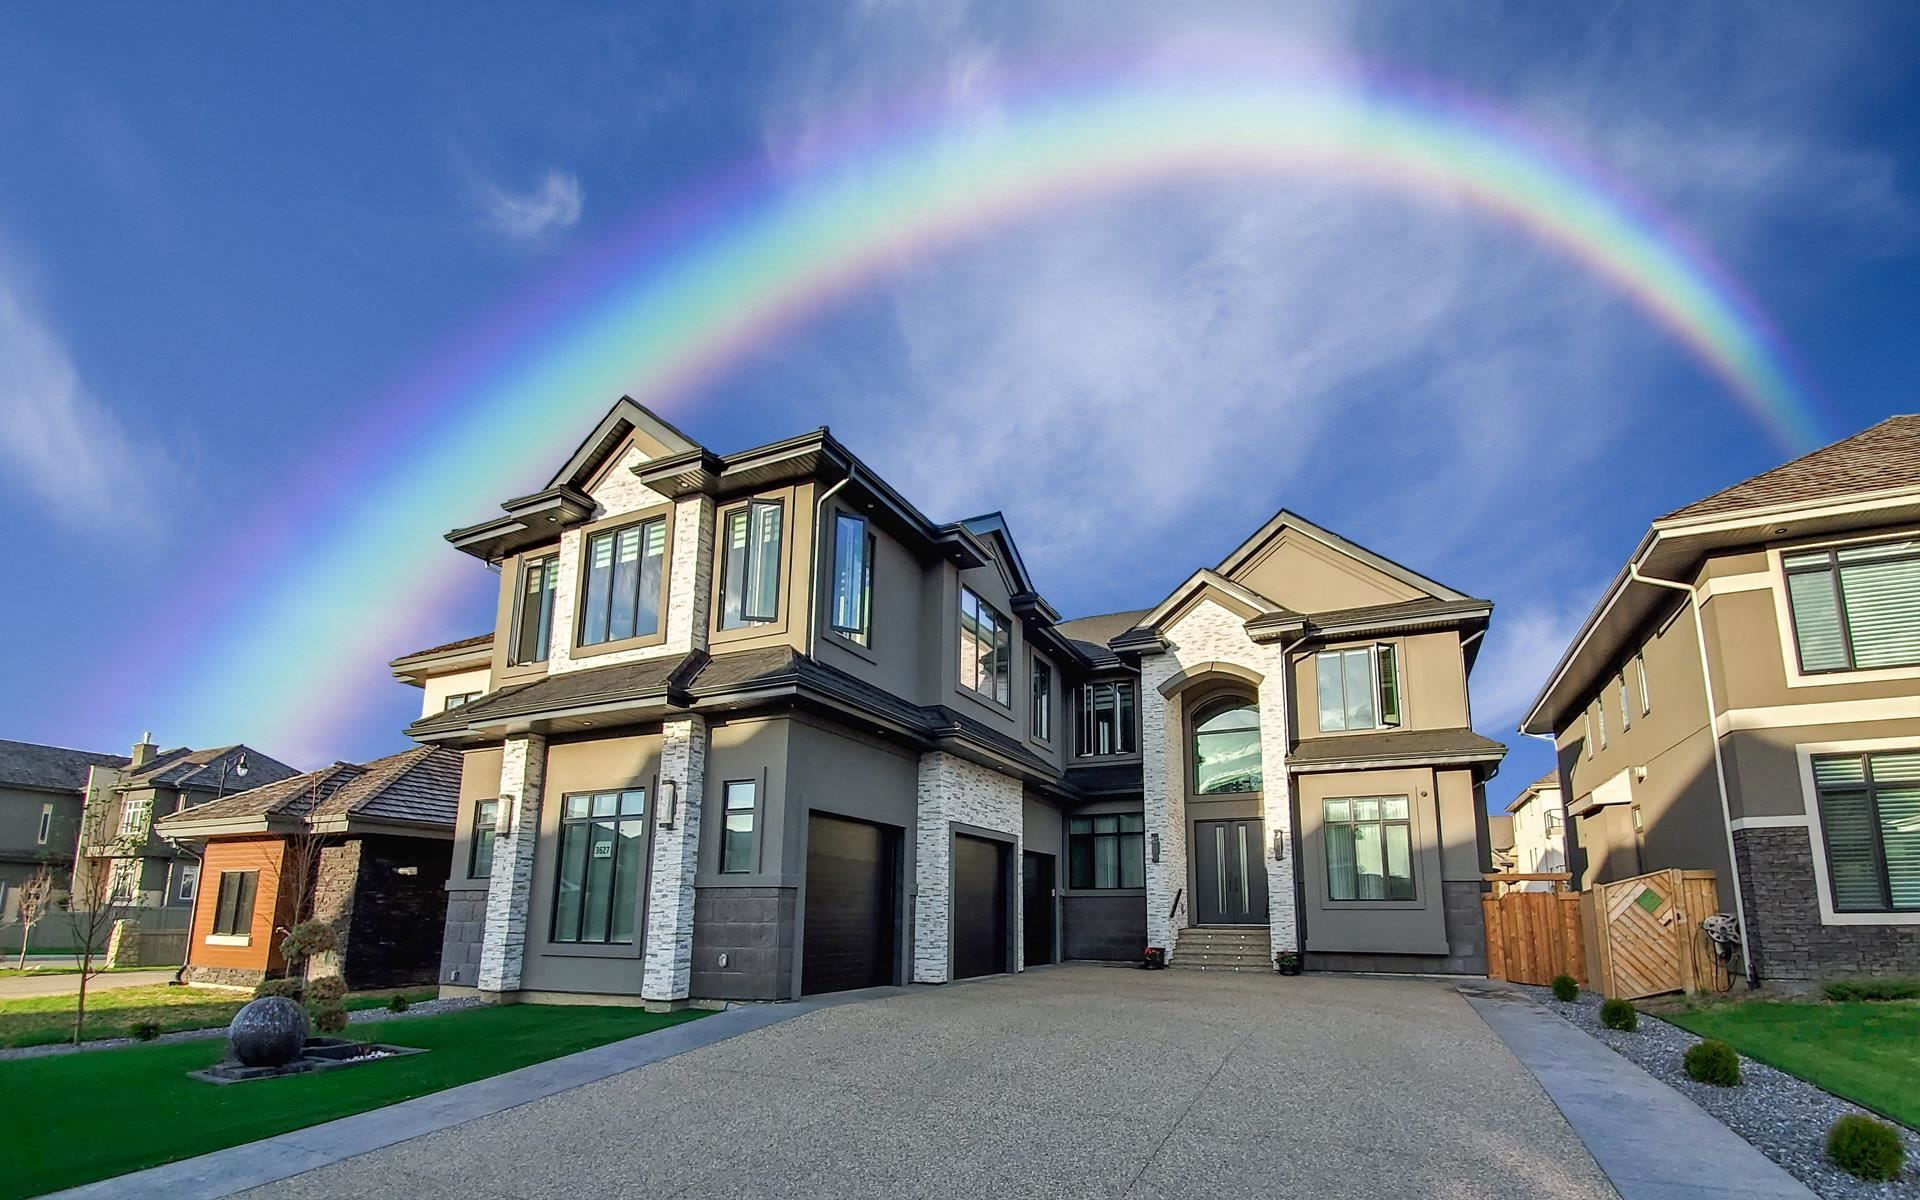 Main Photo: 3627 Westcliff Way in Edmonton: Zone 56 House for sale : MLS®# E4254045